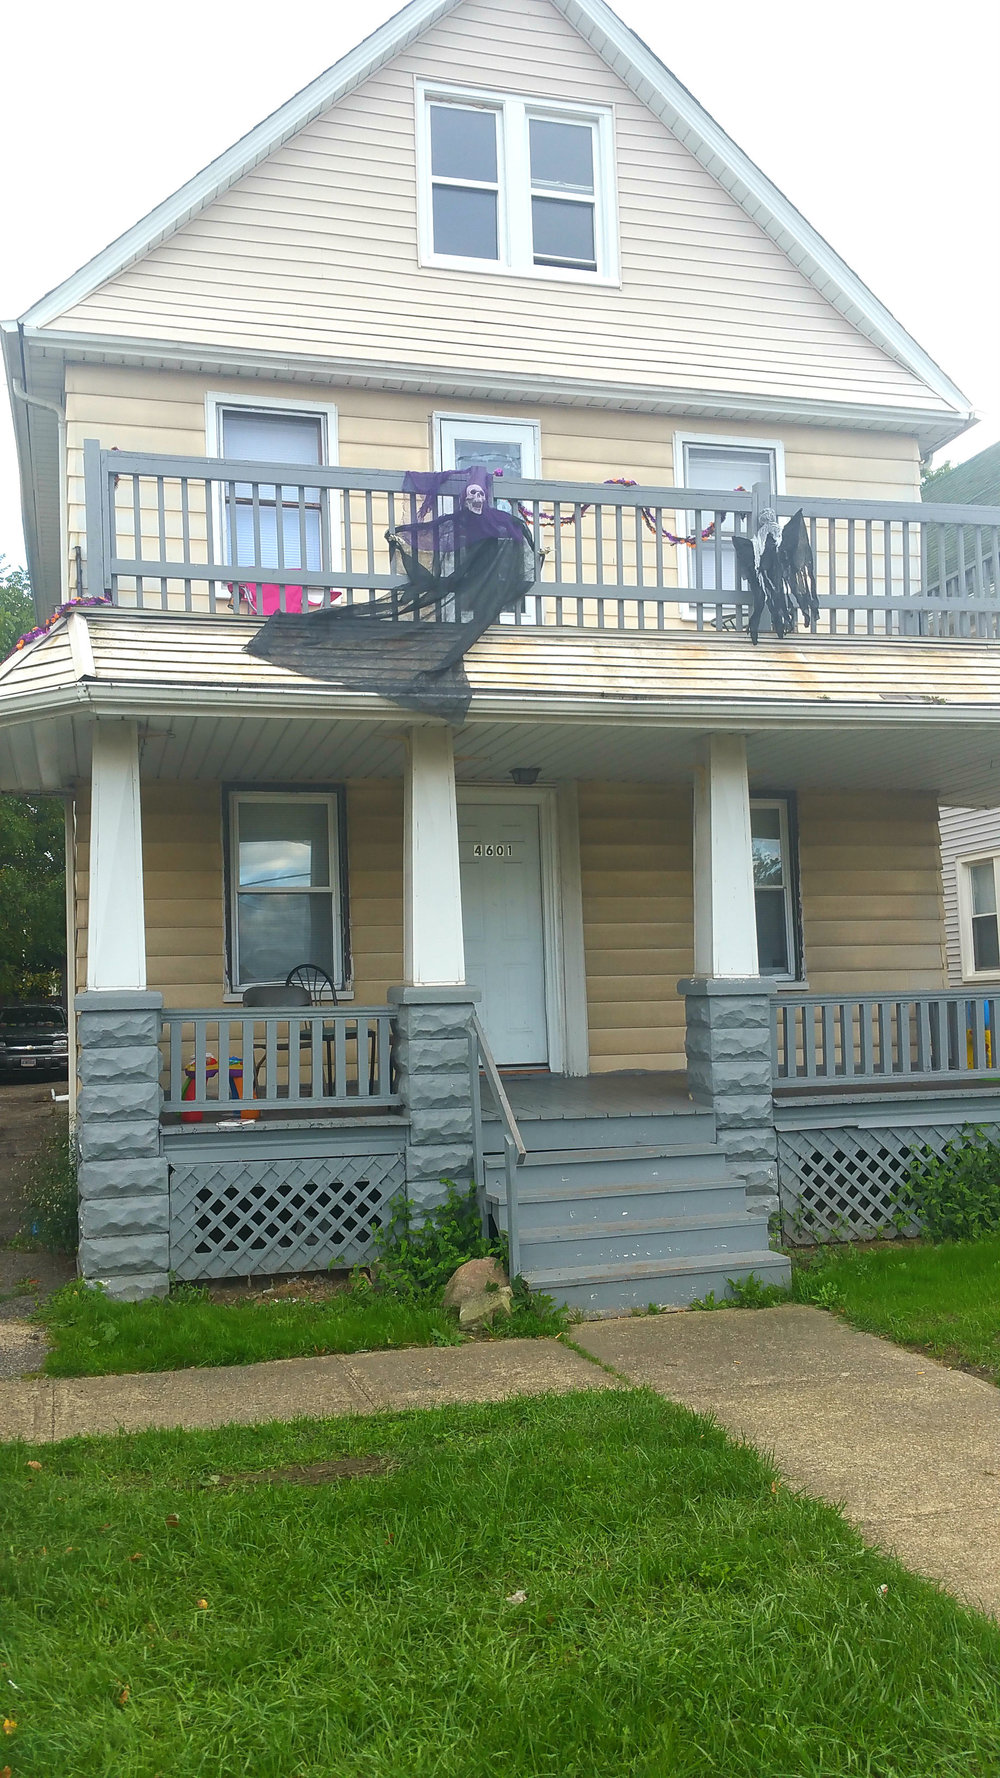 4601 Memphis Ave., Cleveland | 5 bed 3 bath | 1,672 Sq. Ft. | $48,500